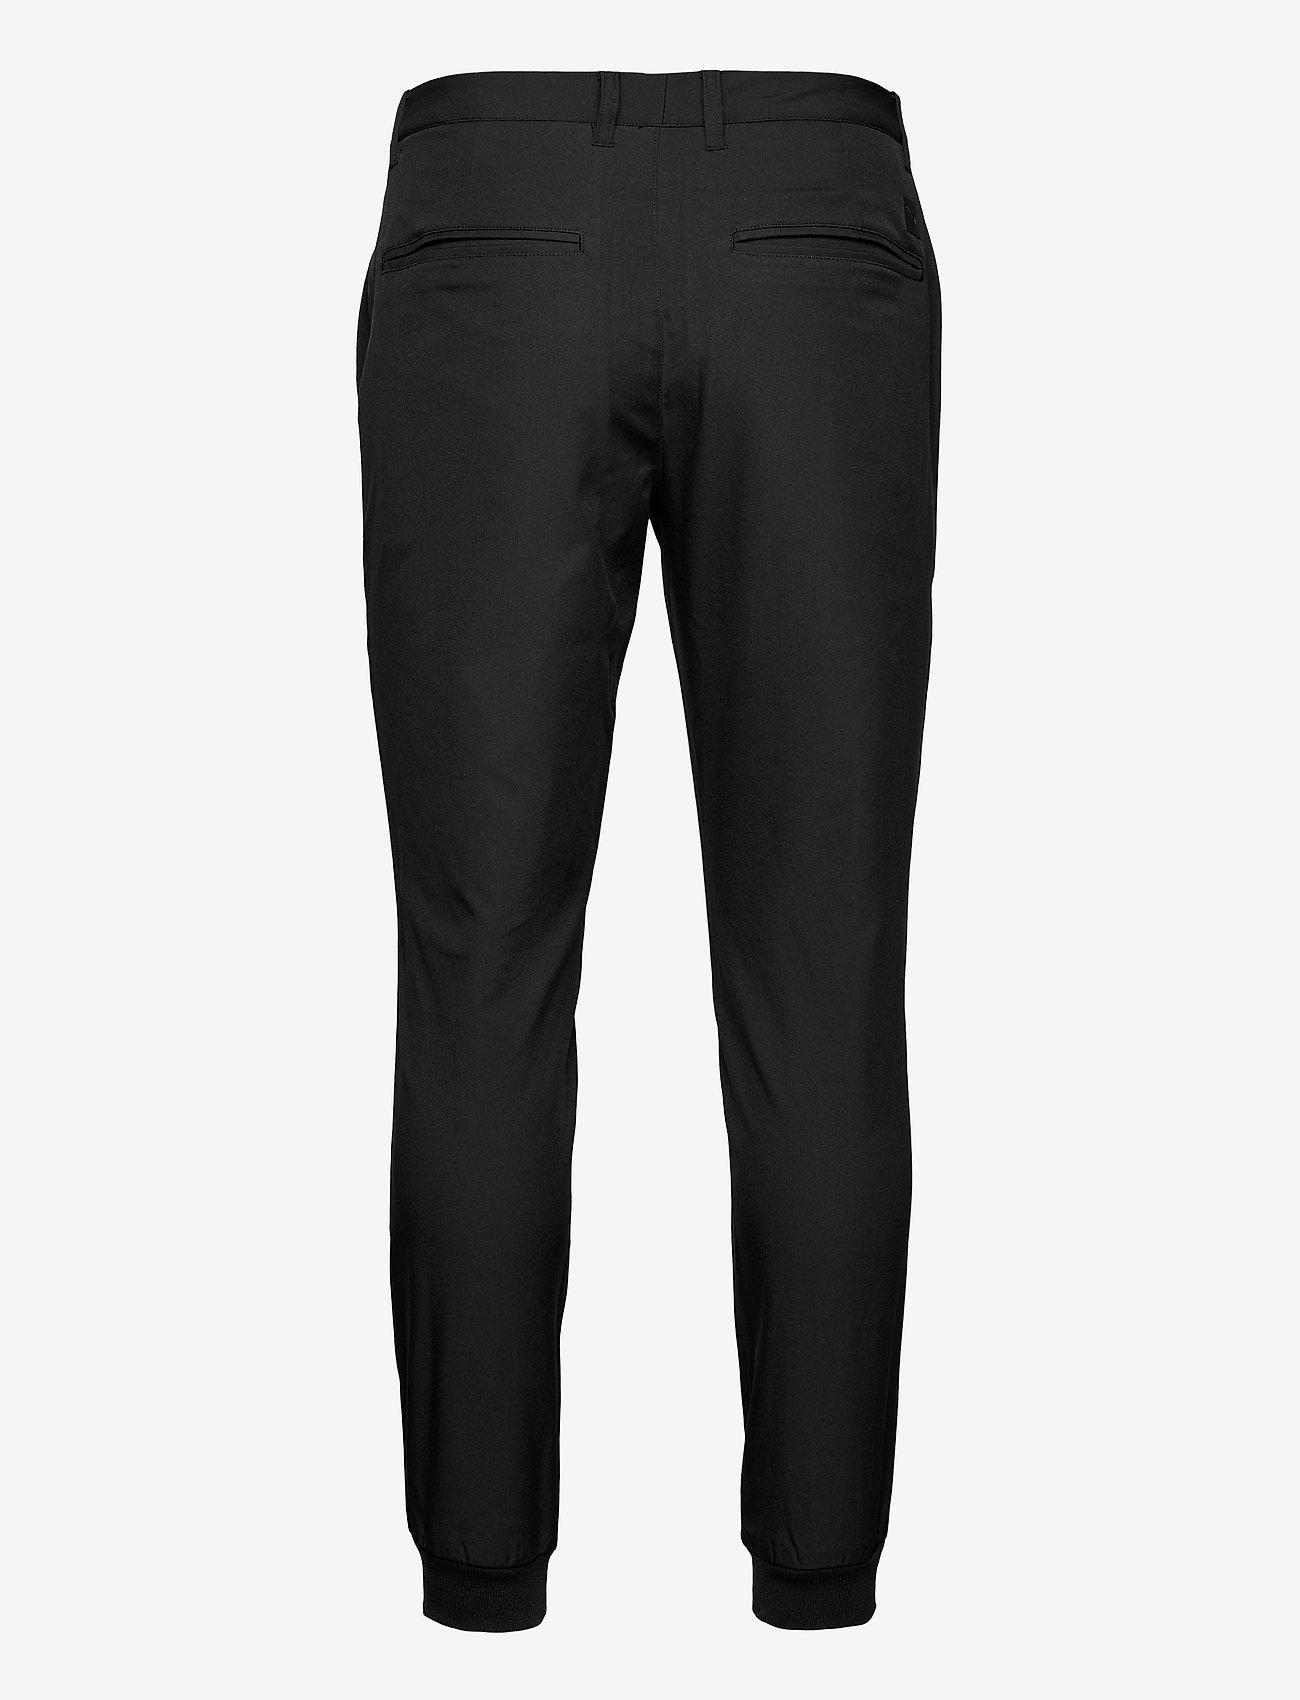 PUMA Golf - Jackpot Jogger - golf pants - puma black - 1